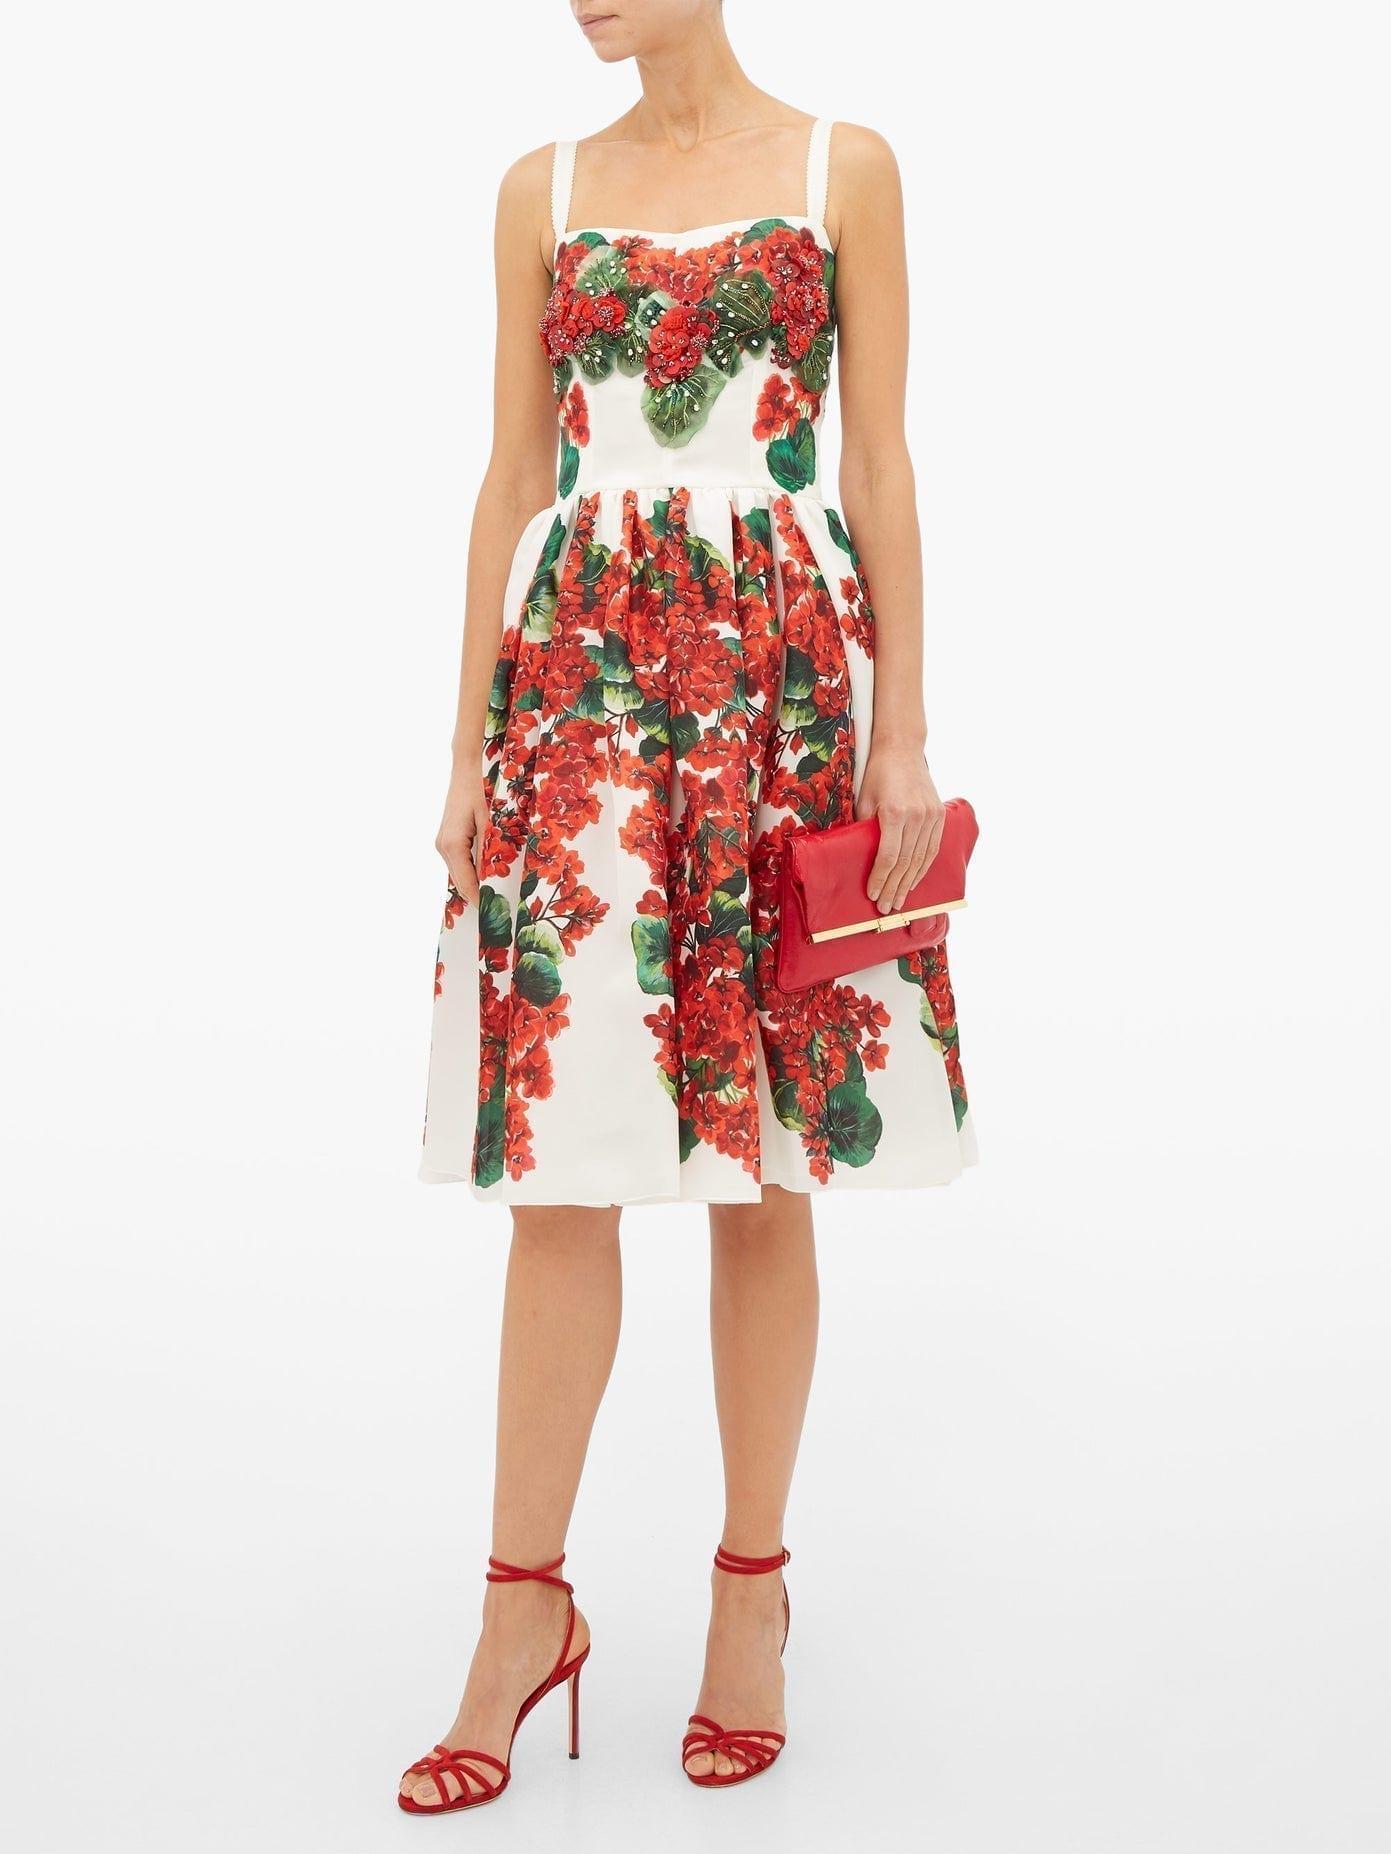 DOLCE & GABBANA Geranium-Print Silk-Organza Dress